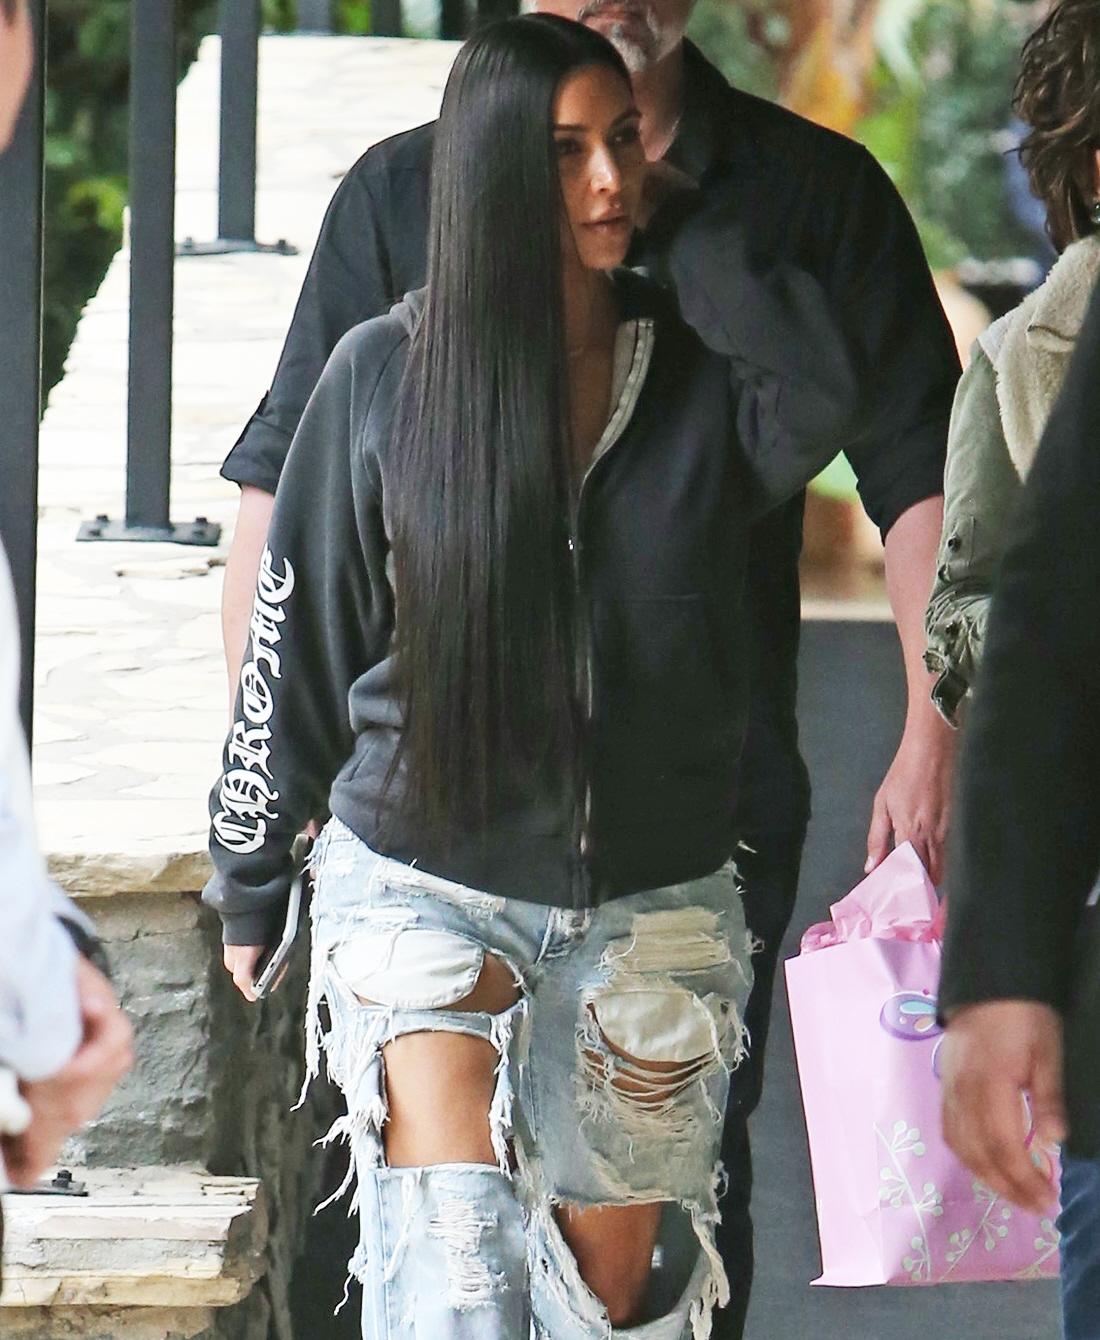 FFN_Kardashian_Kim_ROC_FF9_010417_52272562  bitchy | Kim Kardashian pap-strolled in gloriously hideous denims: did you miss this? FFN Kardashian Kim ROC FF9 010417 52272562